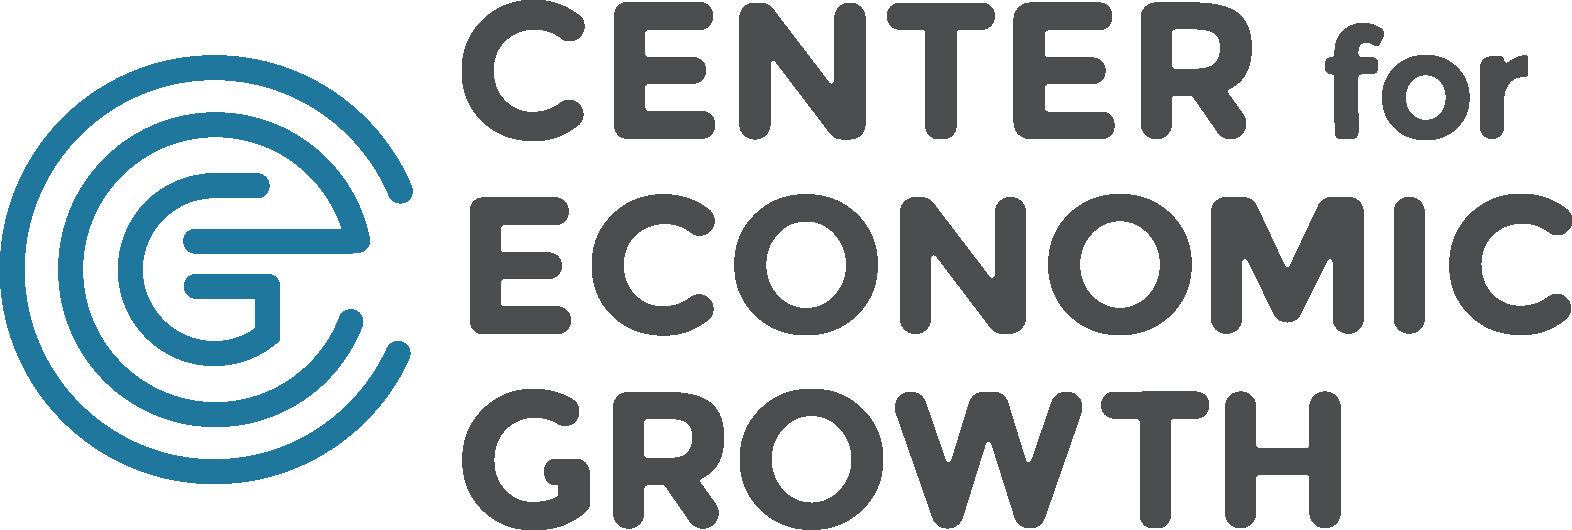 CEG-brand logo-main-RGB.png